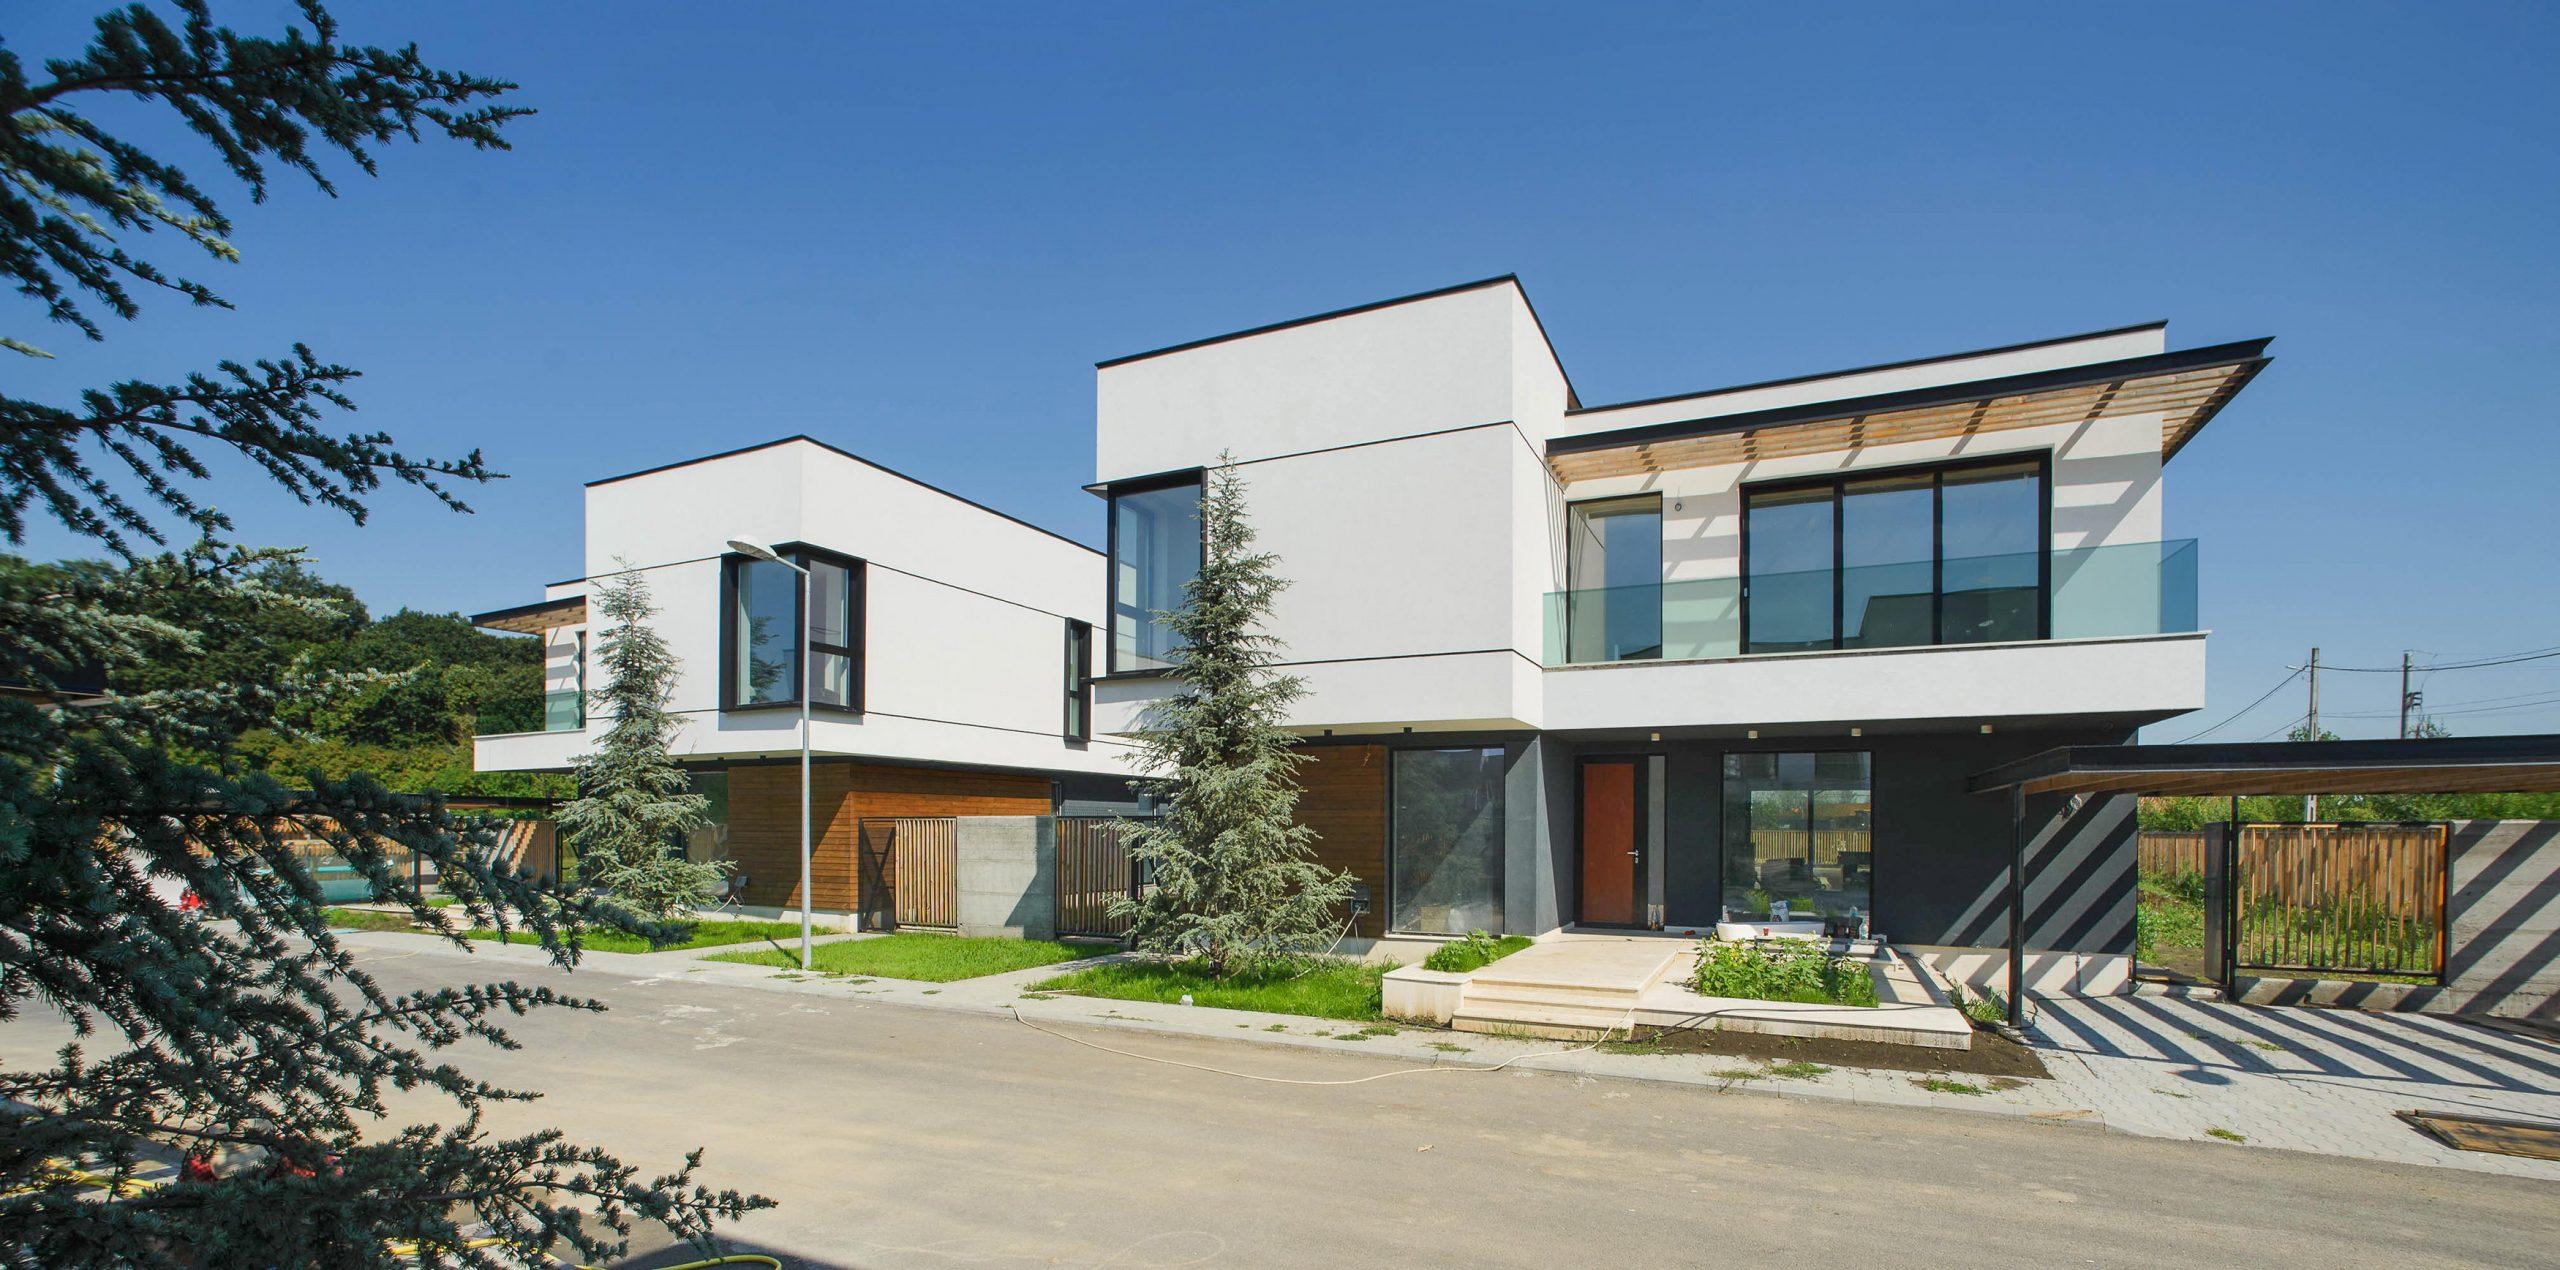 https://nbc-arhitect.ro/wp-content/uploads/2020/10/NBC-Arhitect-_-Arcstil_Residence-_-Romania-_-exterior-view_3-scaled.jpg